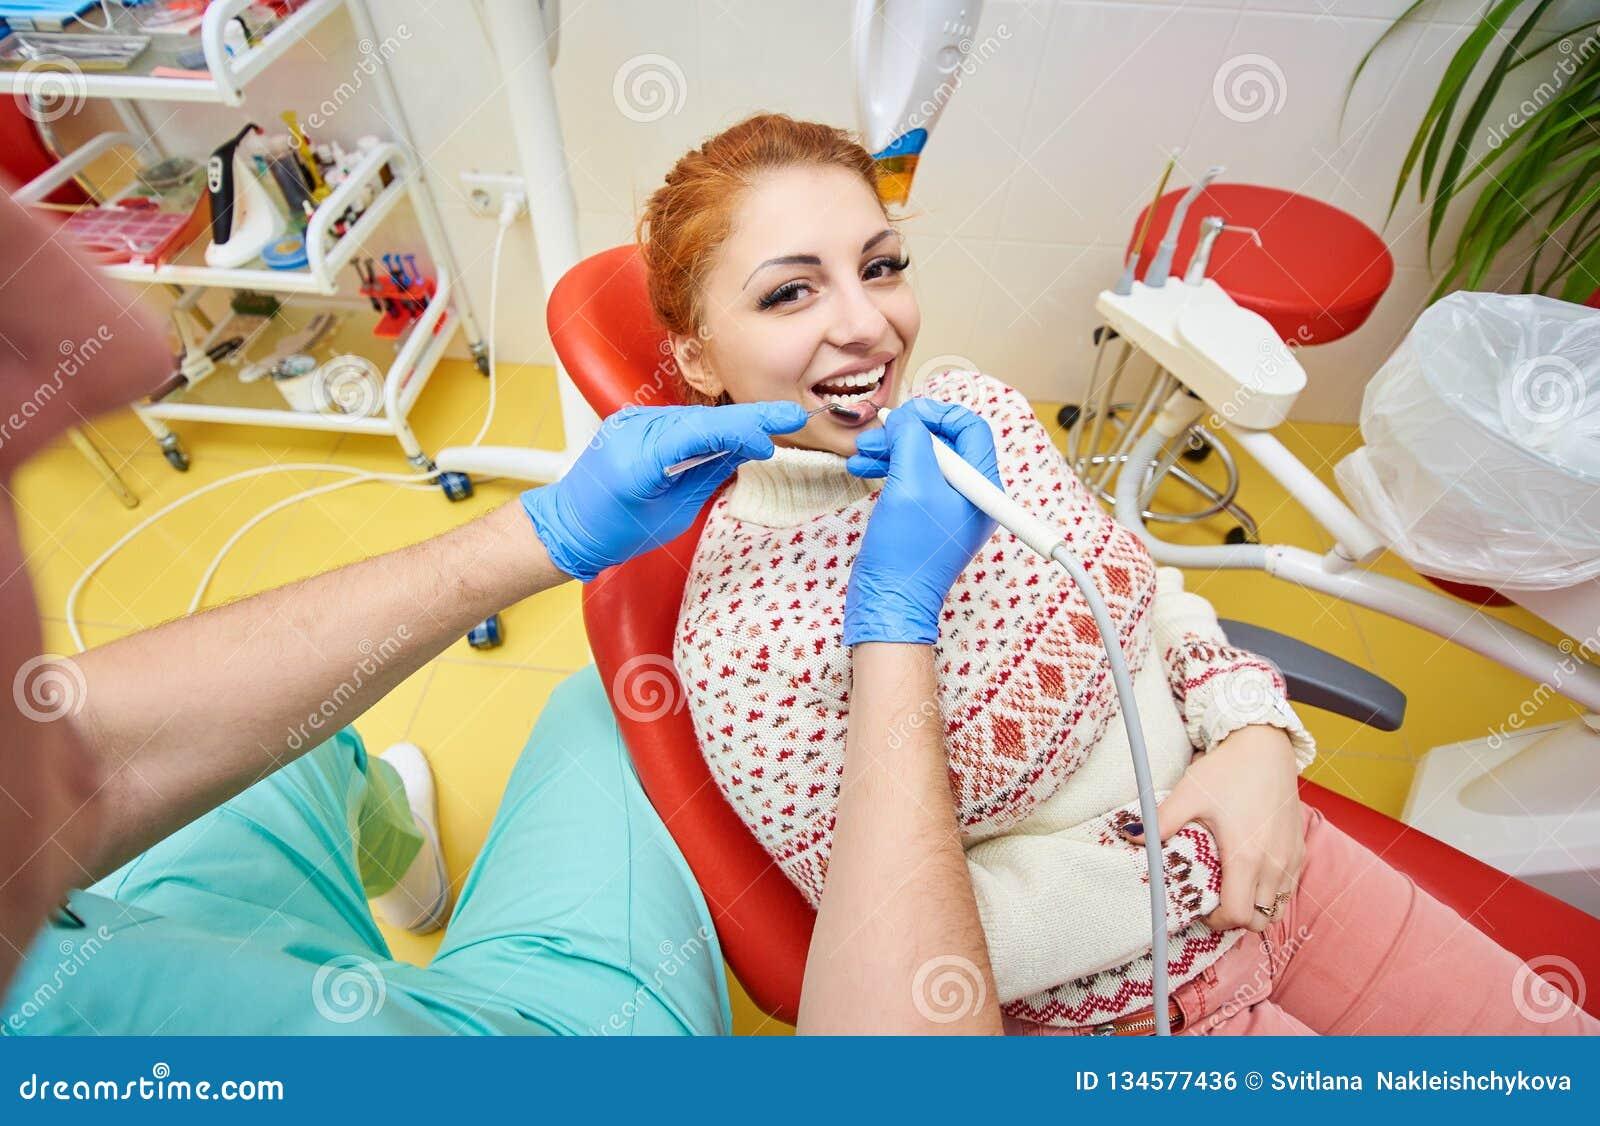 Dental office, dental treatment, health prevention